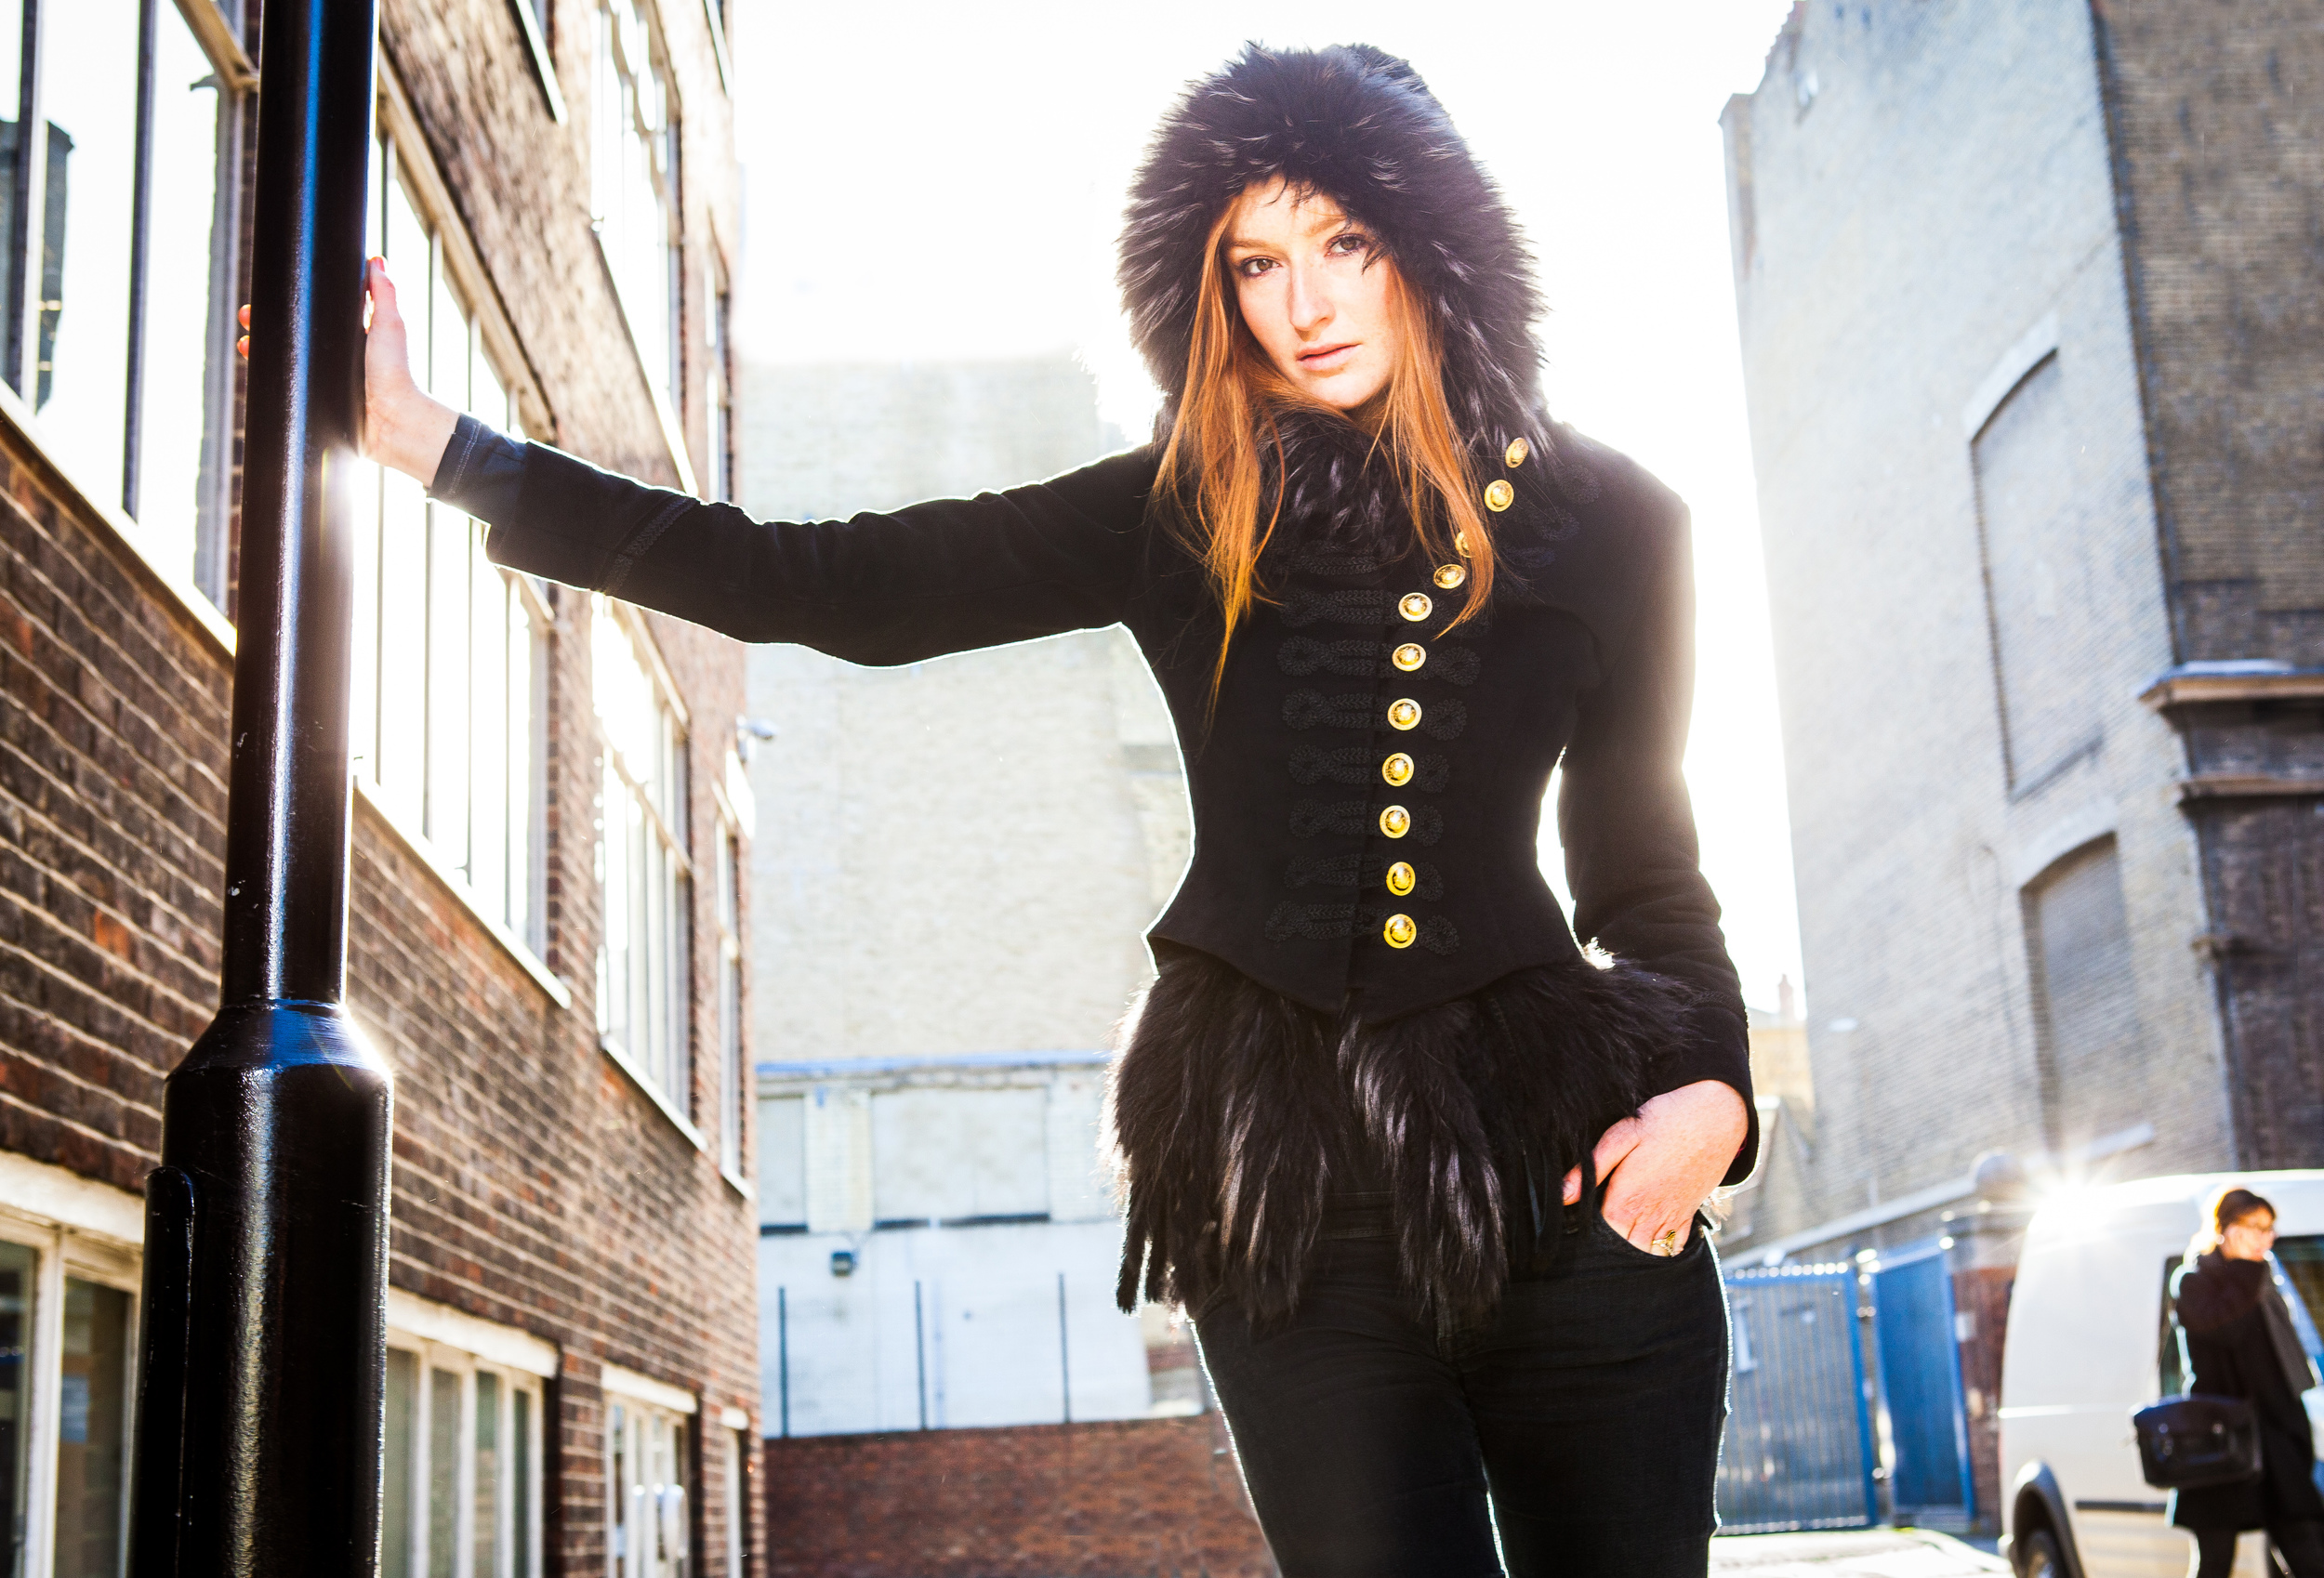 Alex black jacket fur trim campaign pic.jpeg